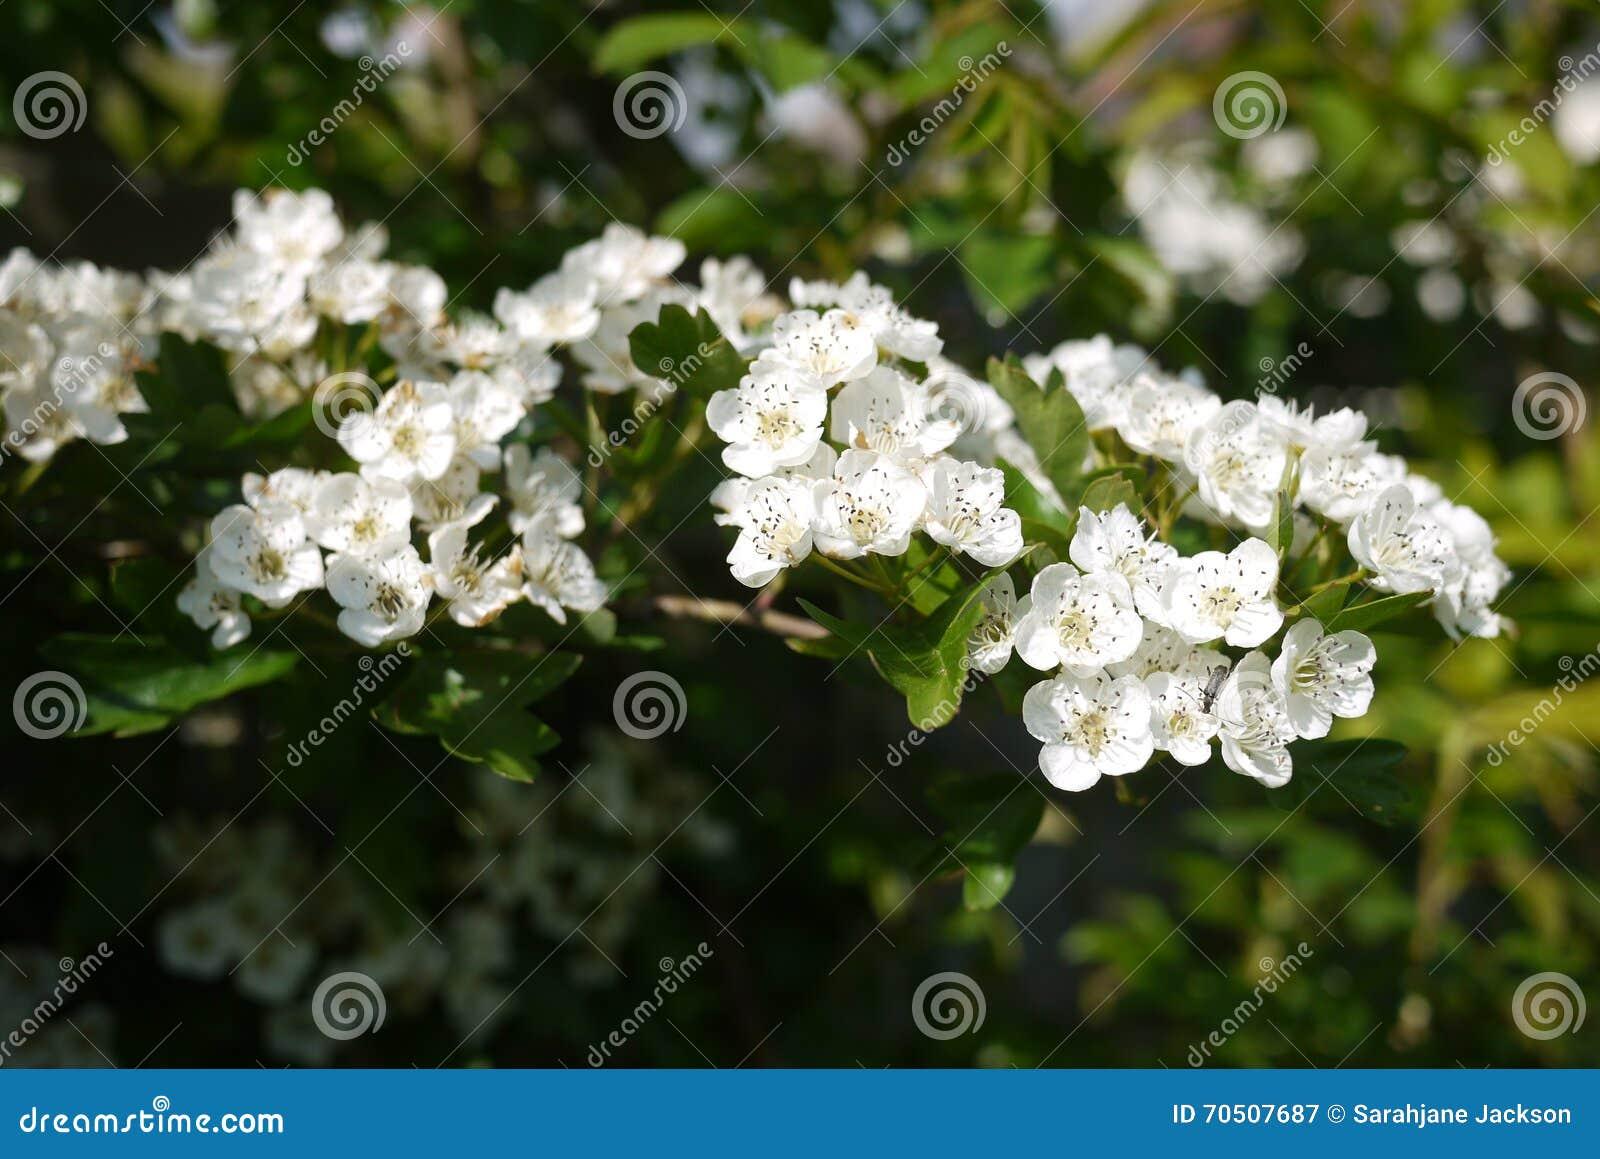 Hawthorn blossom spring flowers english hedgerow stock image image download hawthorn blossom spring flowers english hedgerow stock image image of hawthorn hedgerow mightylinksfo